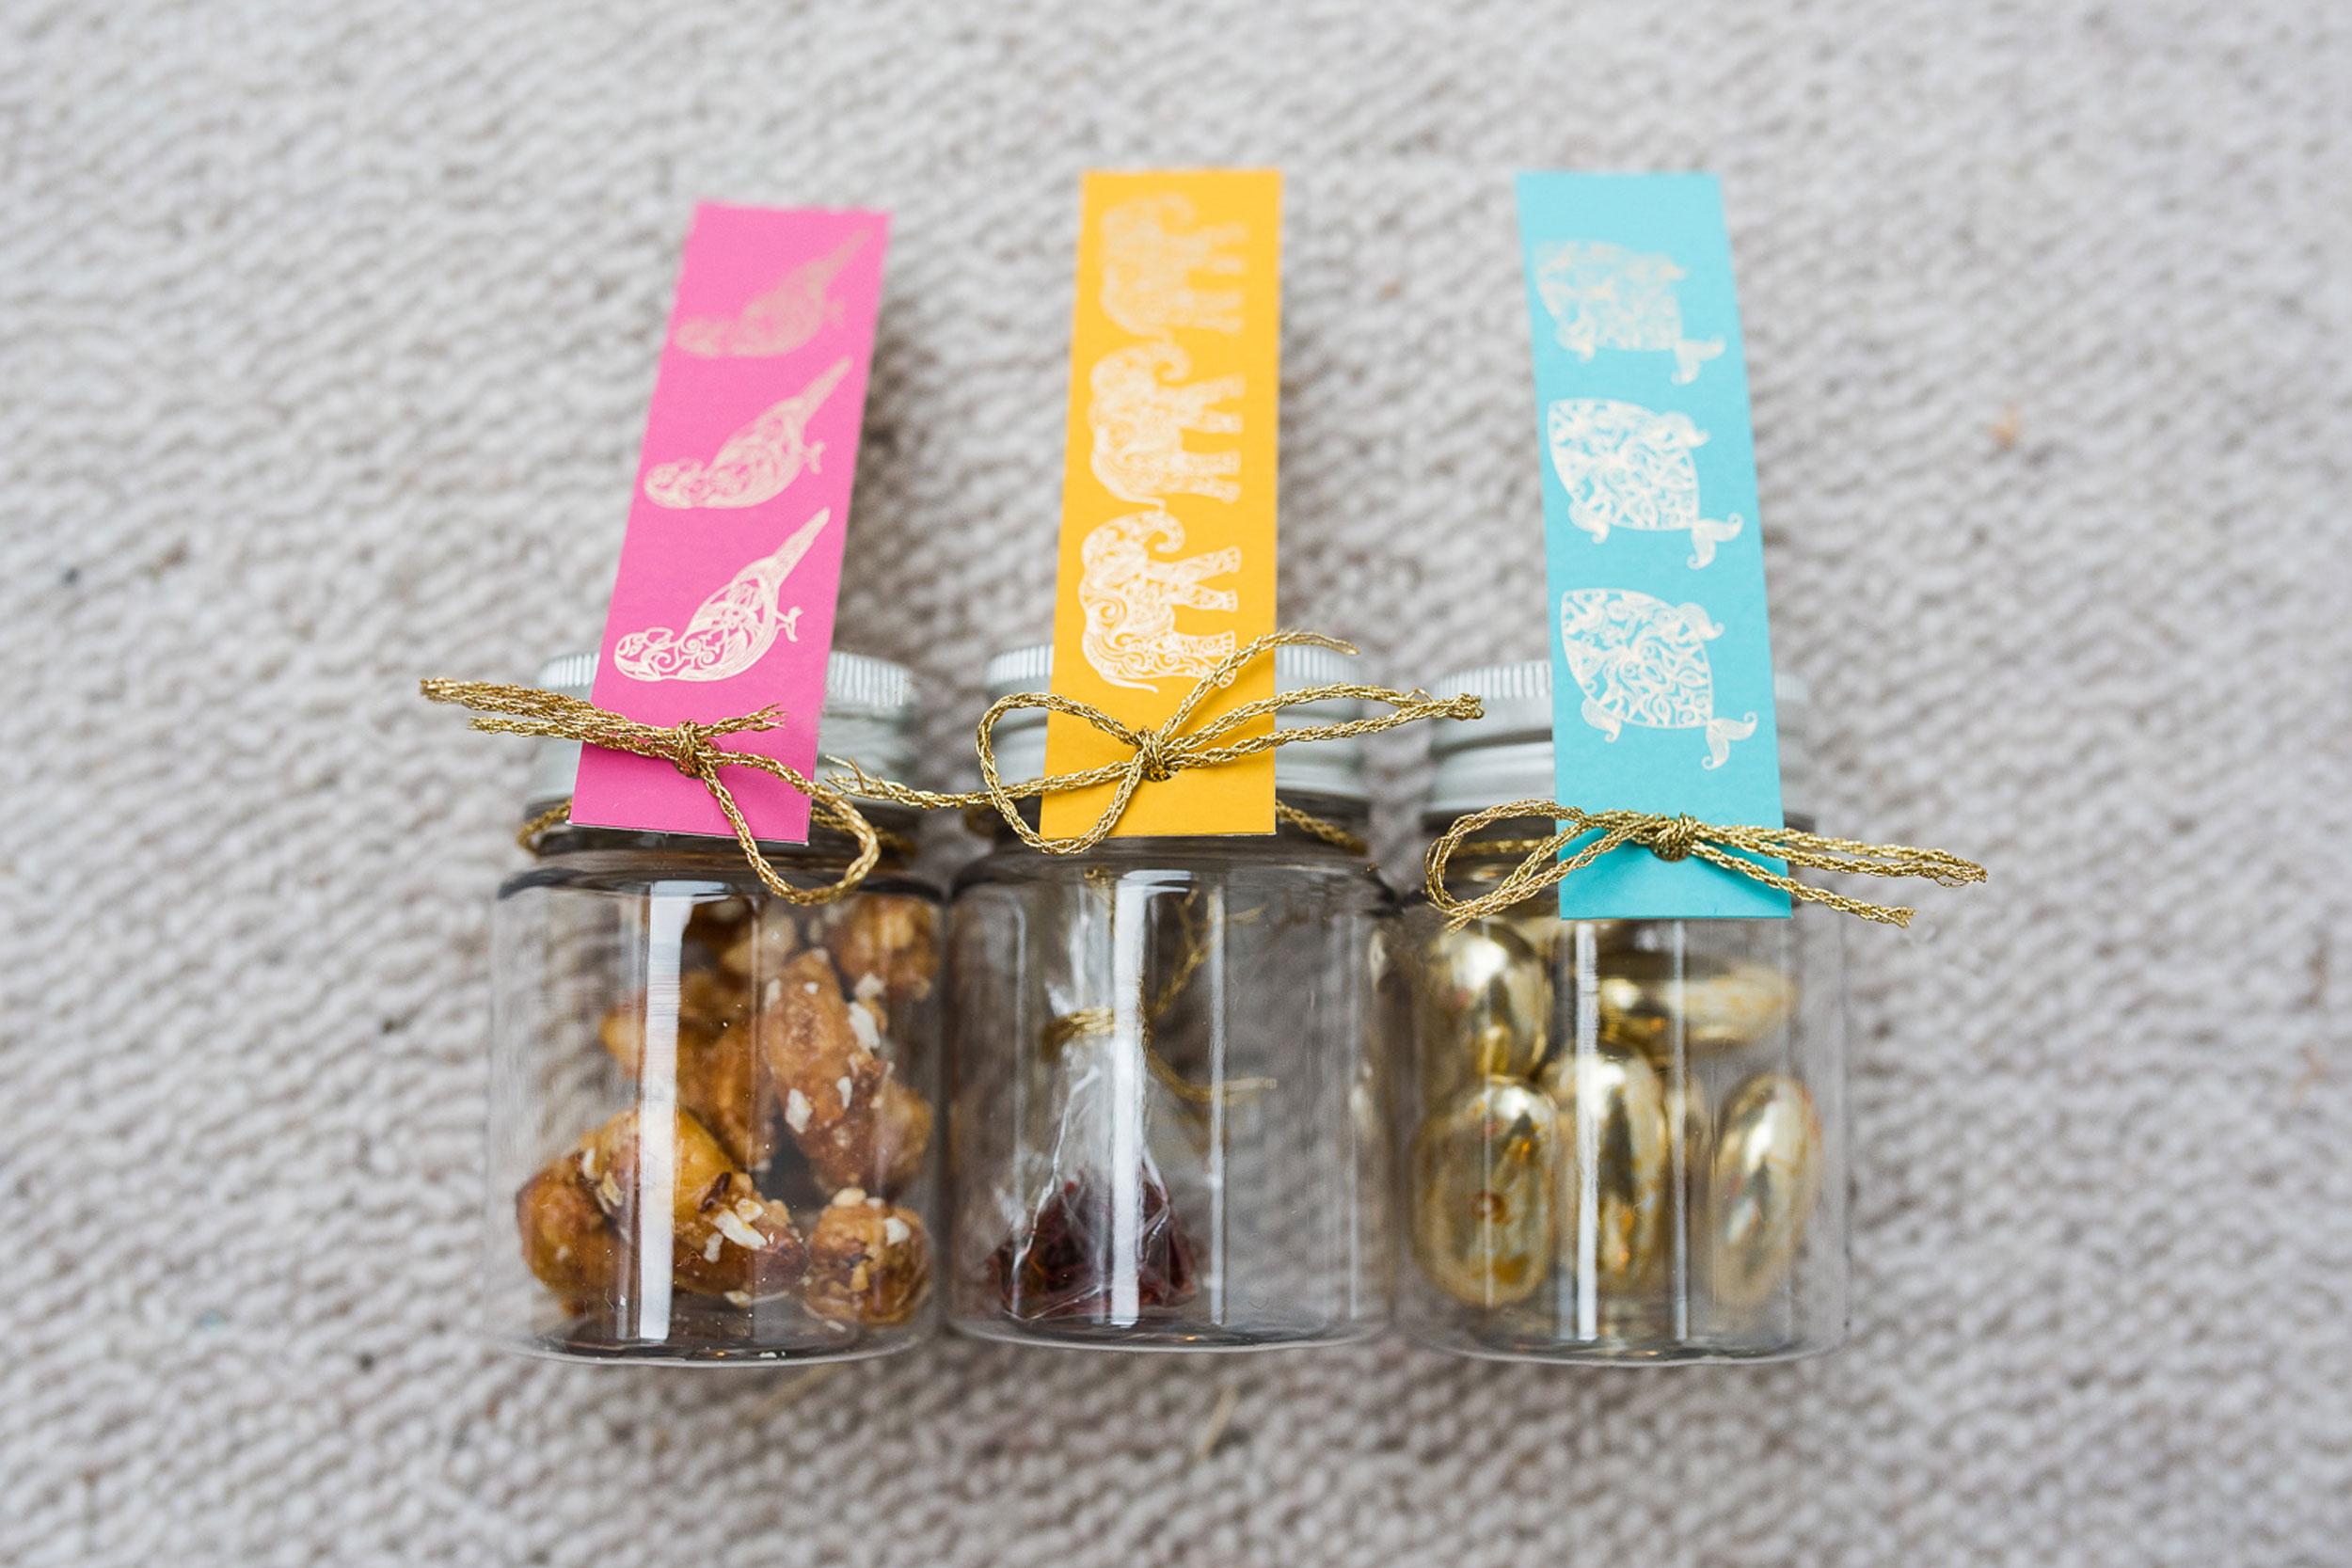 trio-of-life-almonds-cashew-nuts-saffron-jars-.jpg